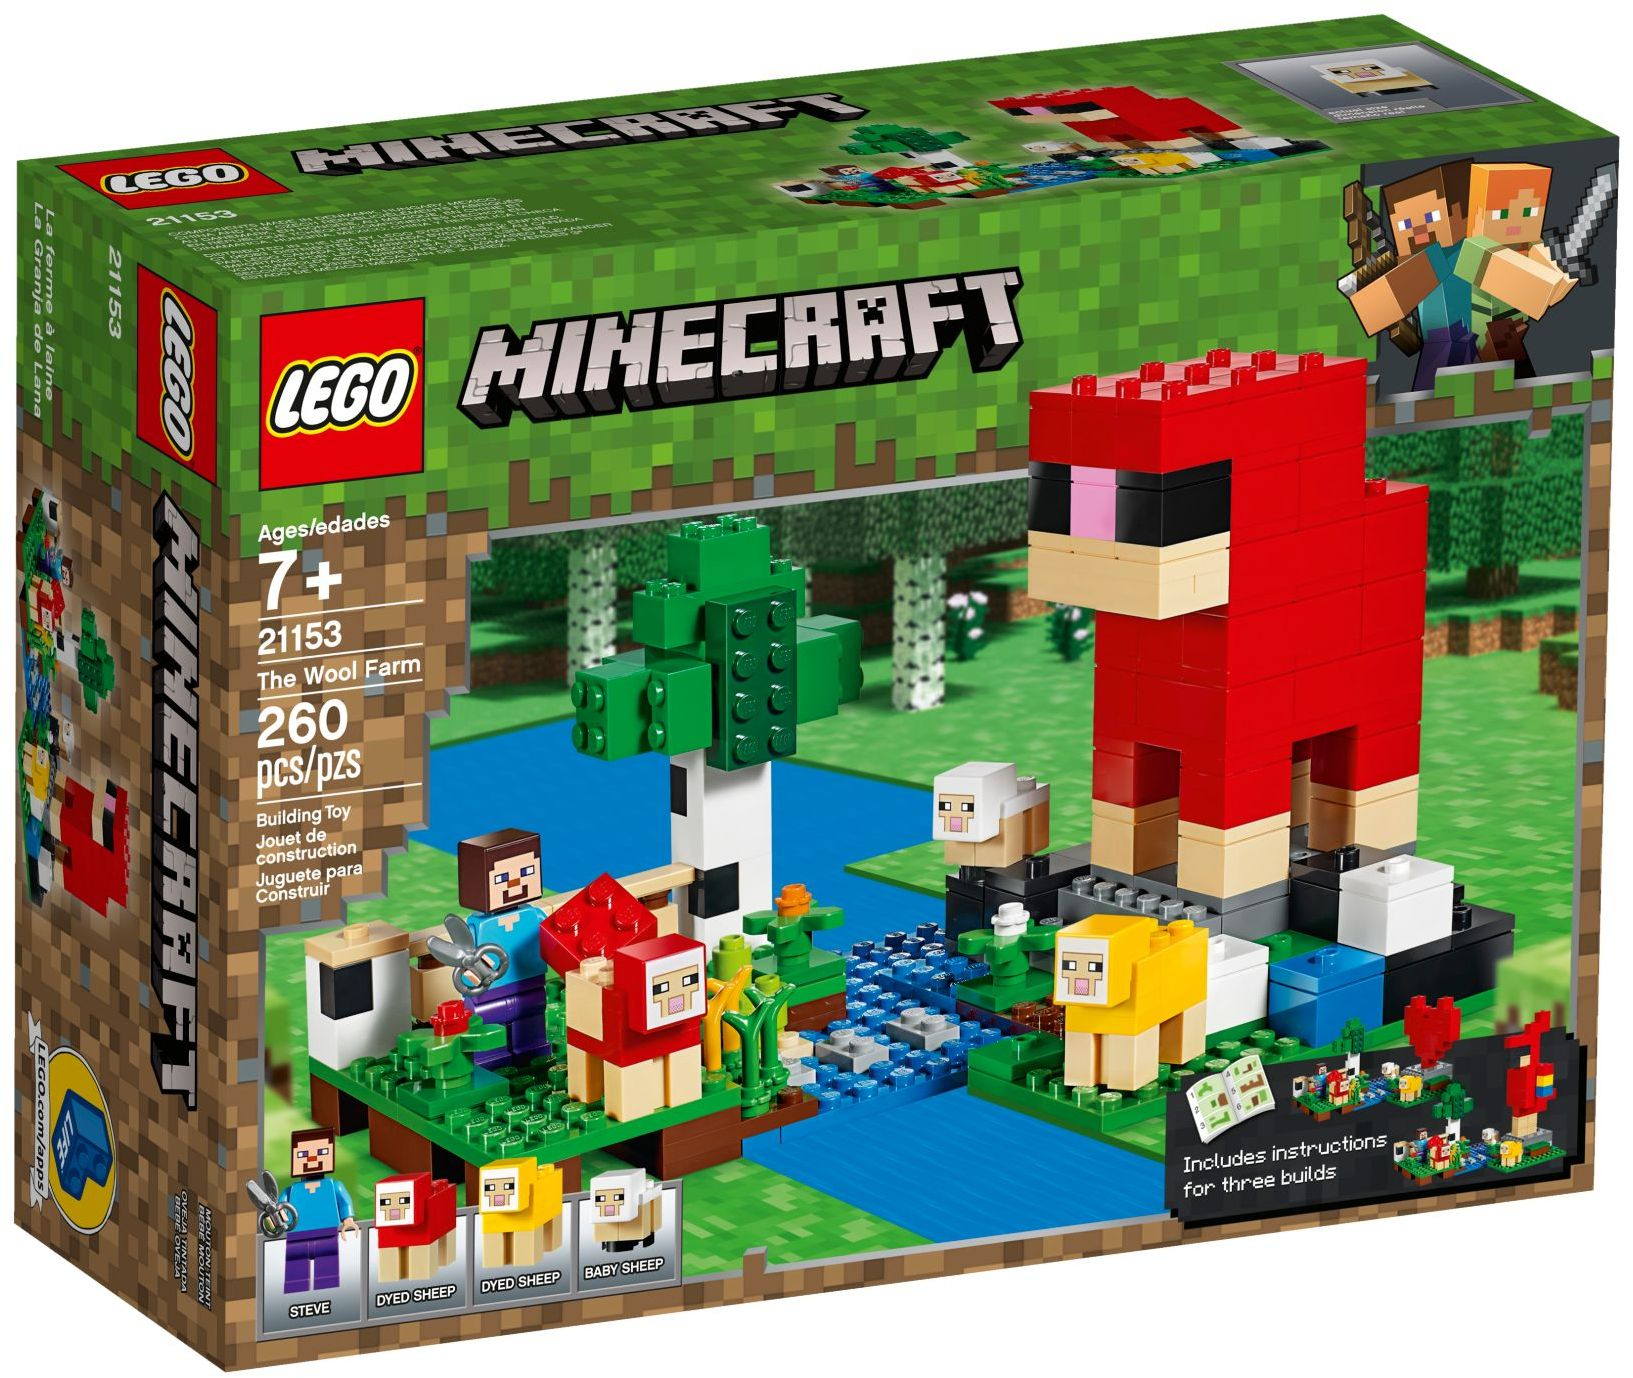 ❤️ 21153 LEGO Minecraft The Wool Farm - Bộ đồ chơi Trang trại sản xuất len